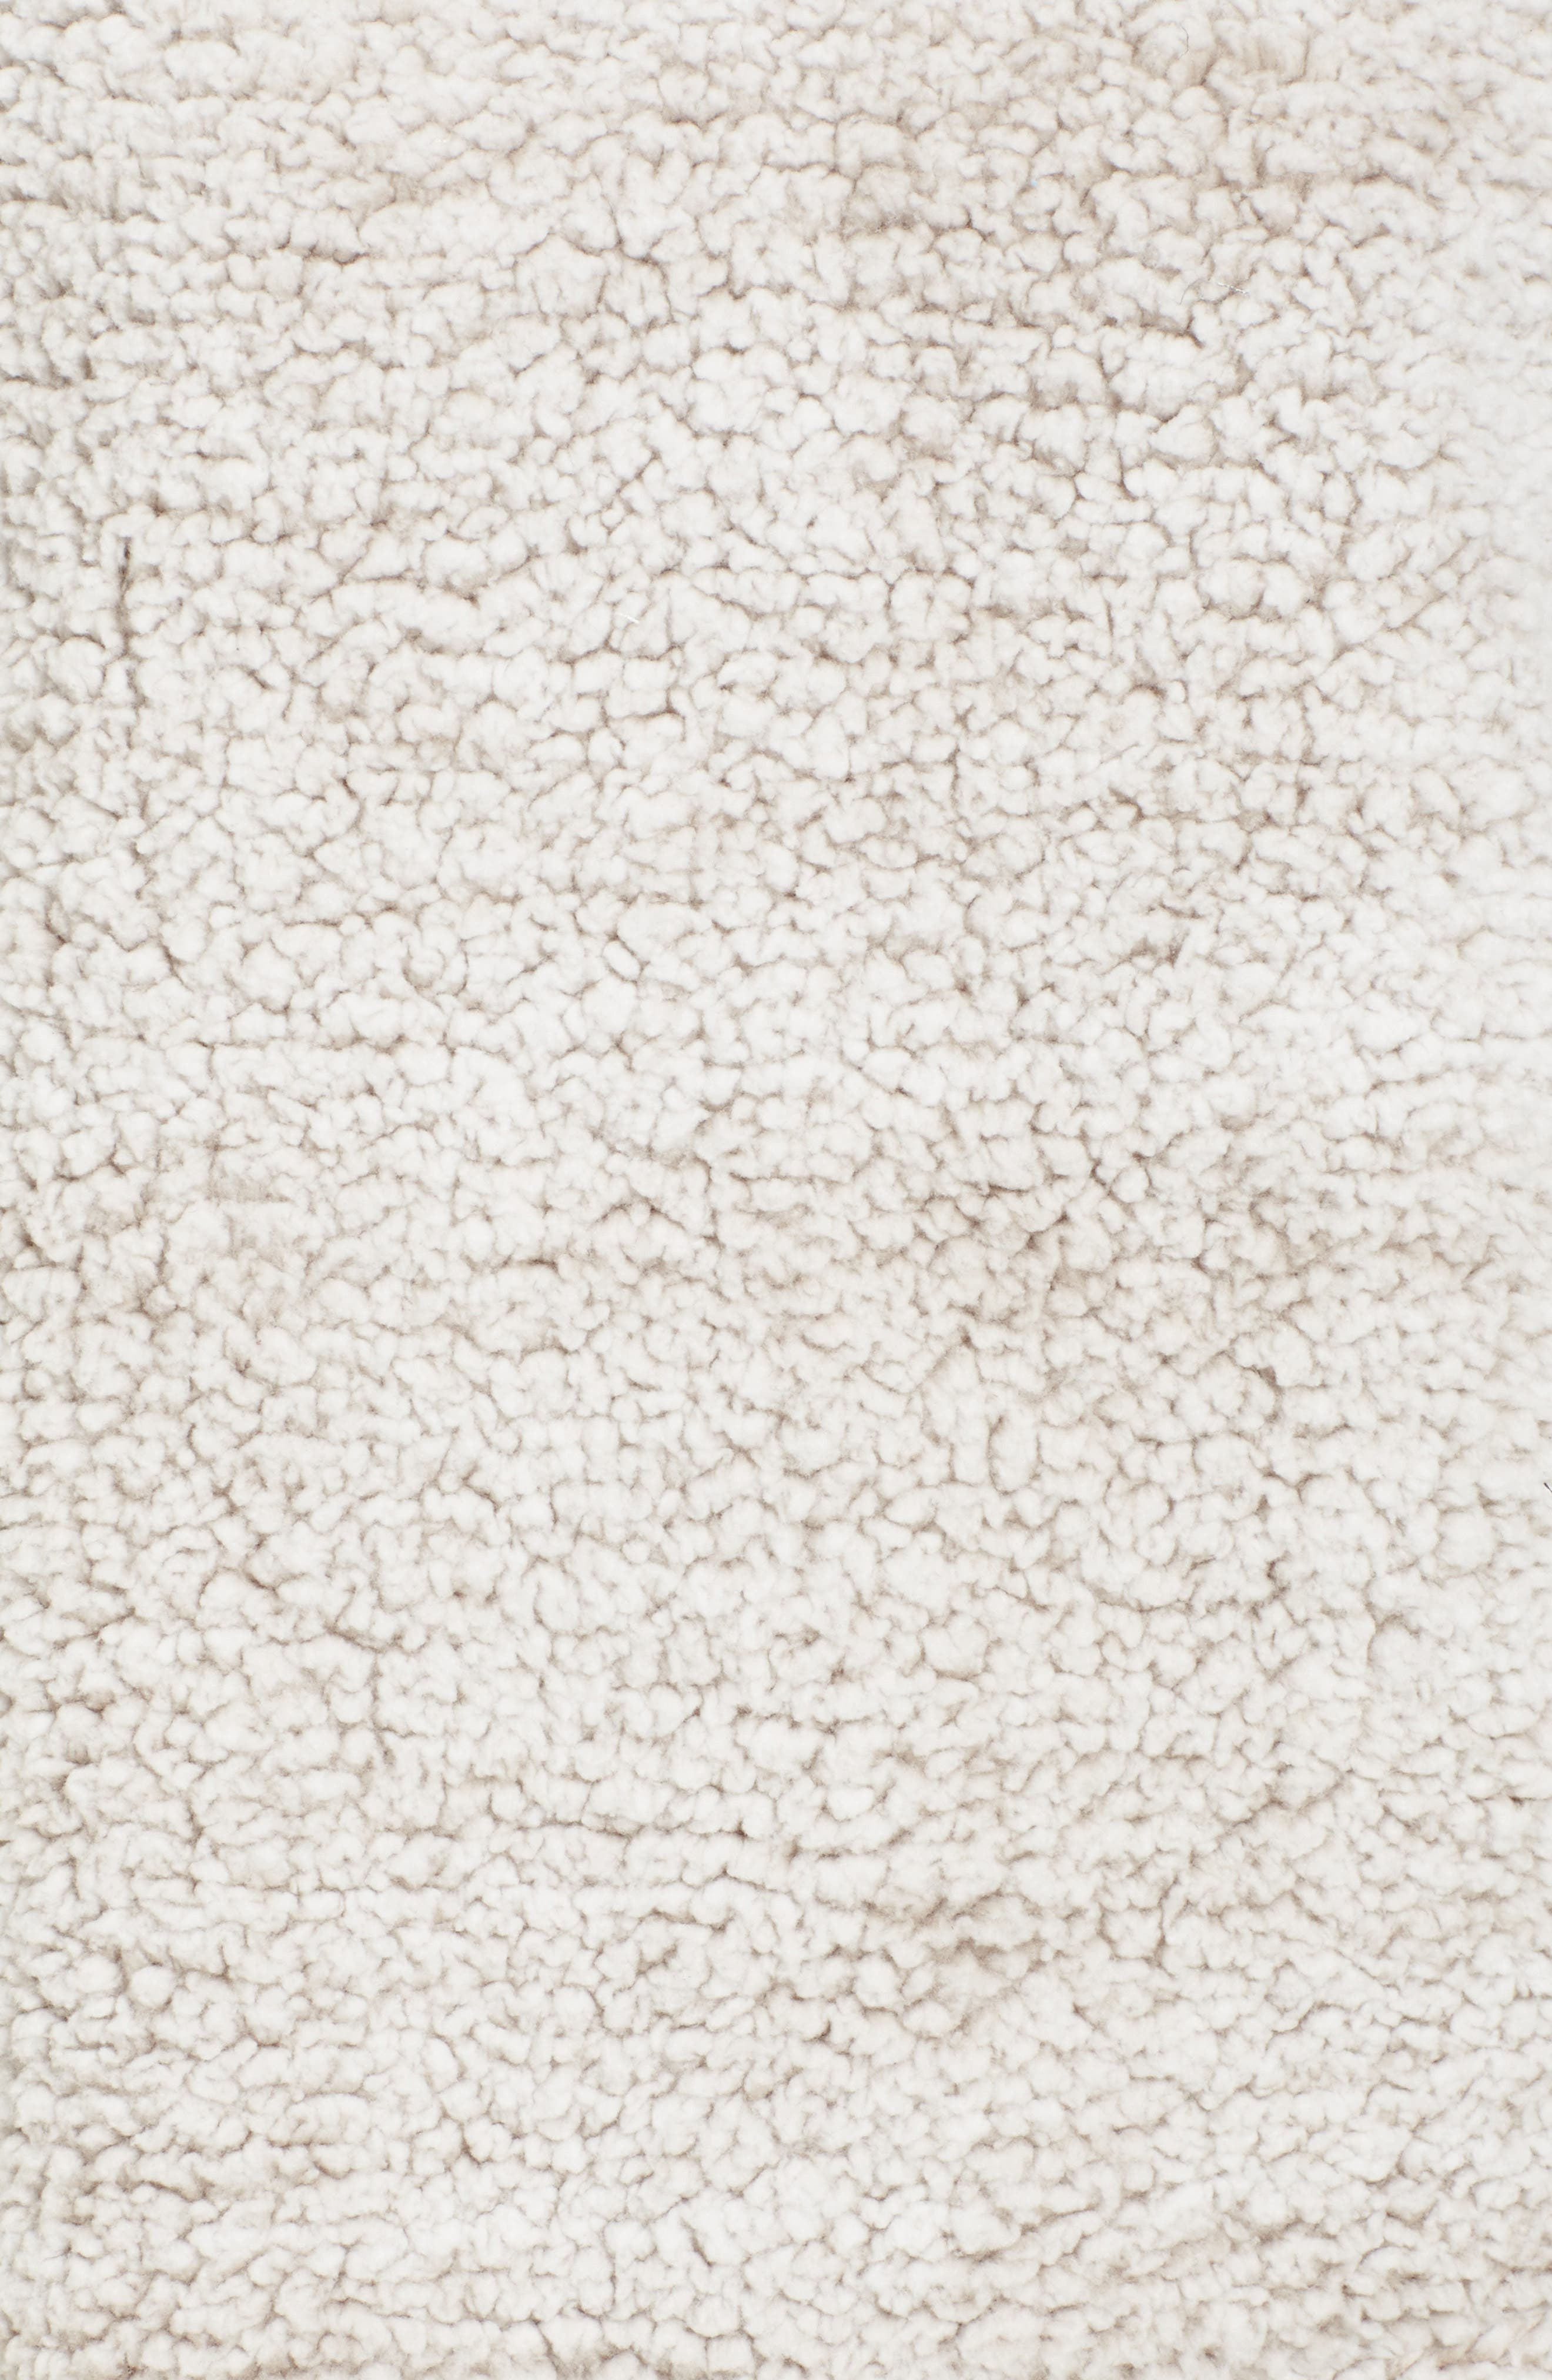 Wubby Fleece Pullover,                             Alternate thumbnail 7, color,                             Ivory